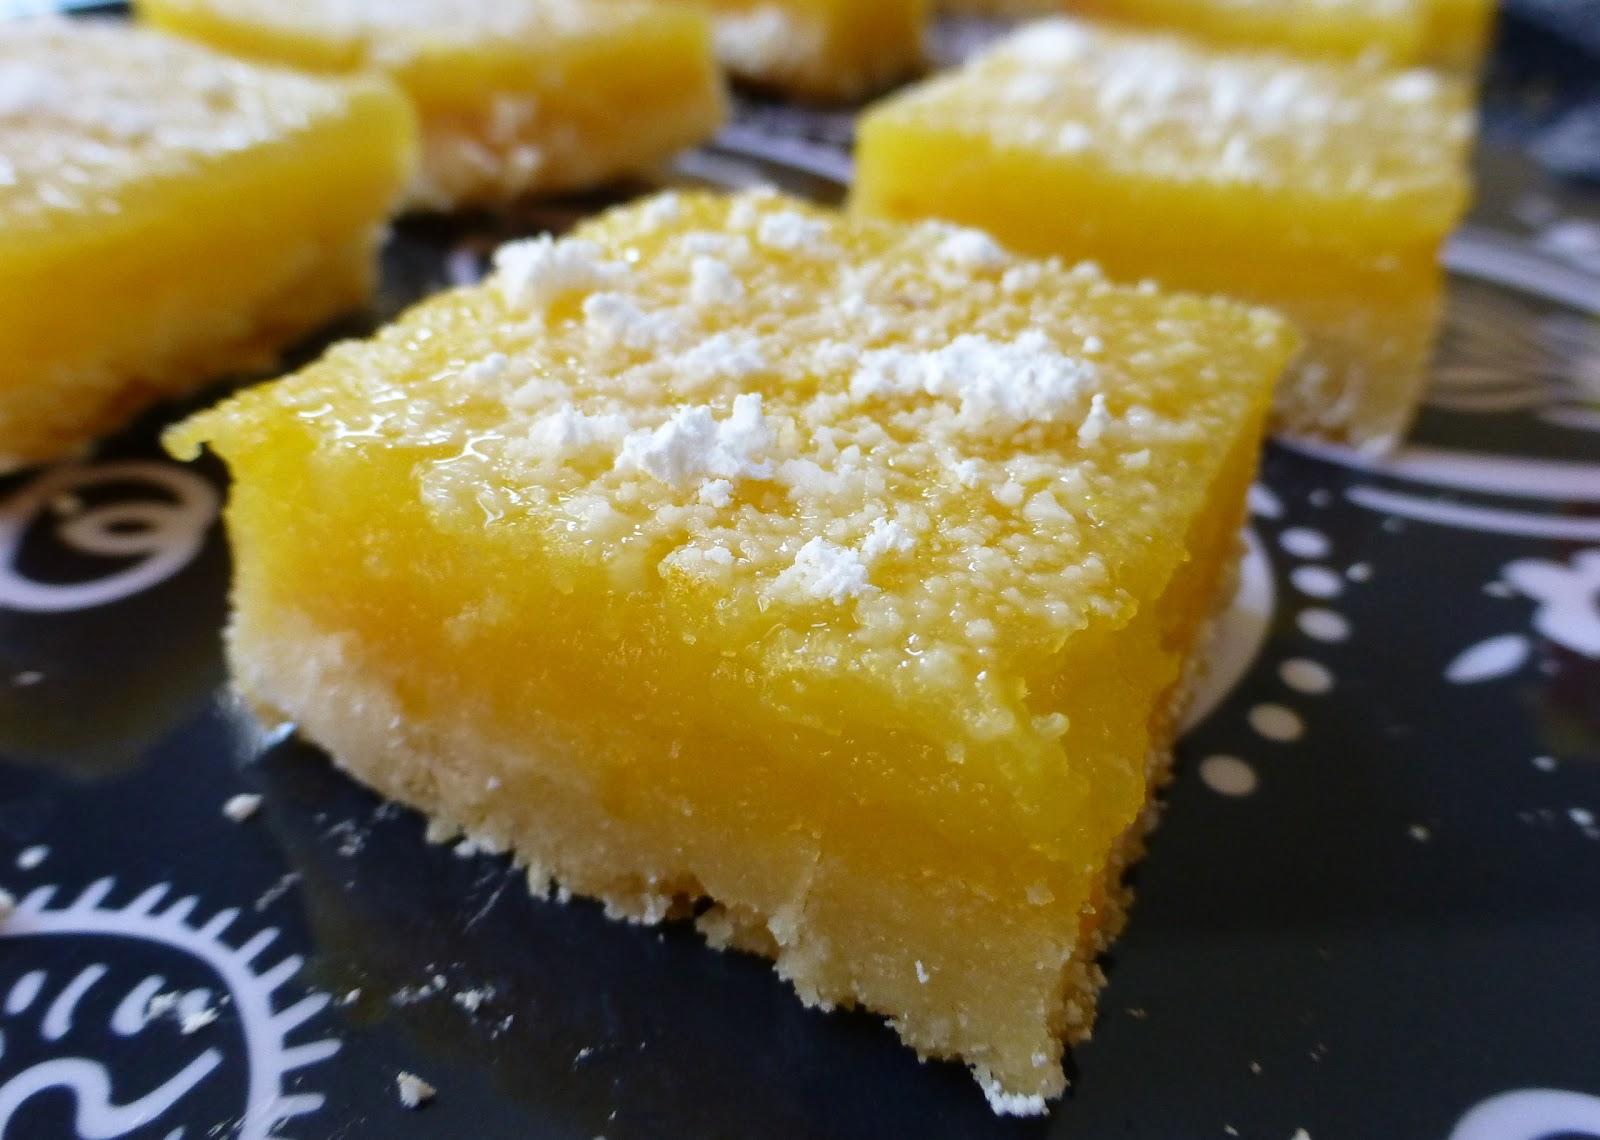 Adventures of Valley Writer: Classic Lemon Bars